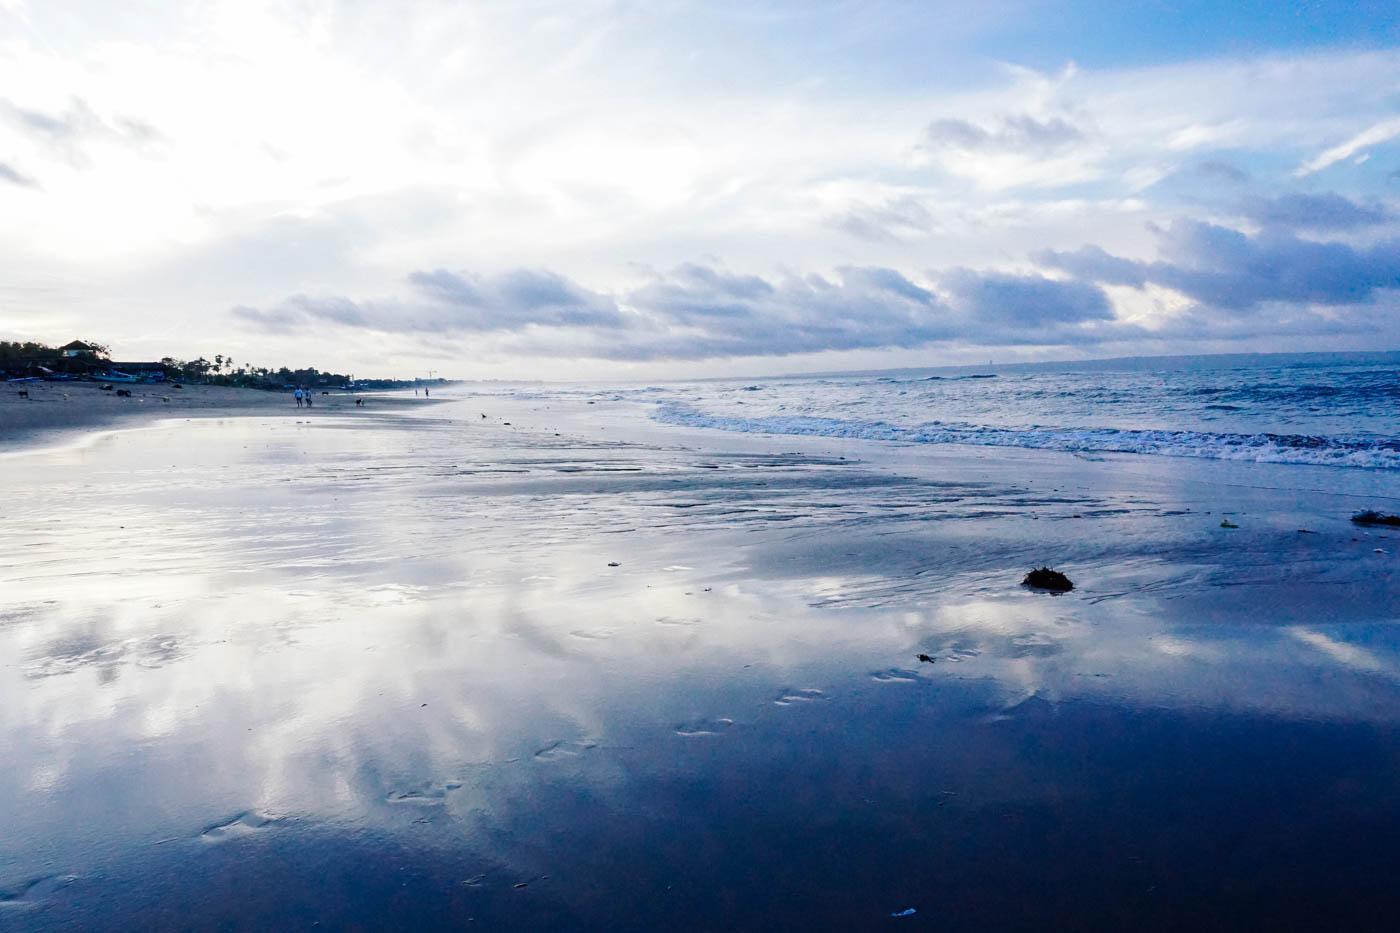 The Bali Wet Season Guide I Bali Travel I Winter Sun I Indonesia I Travel #traveldestinations #traveltips #bali #indonesia